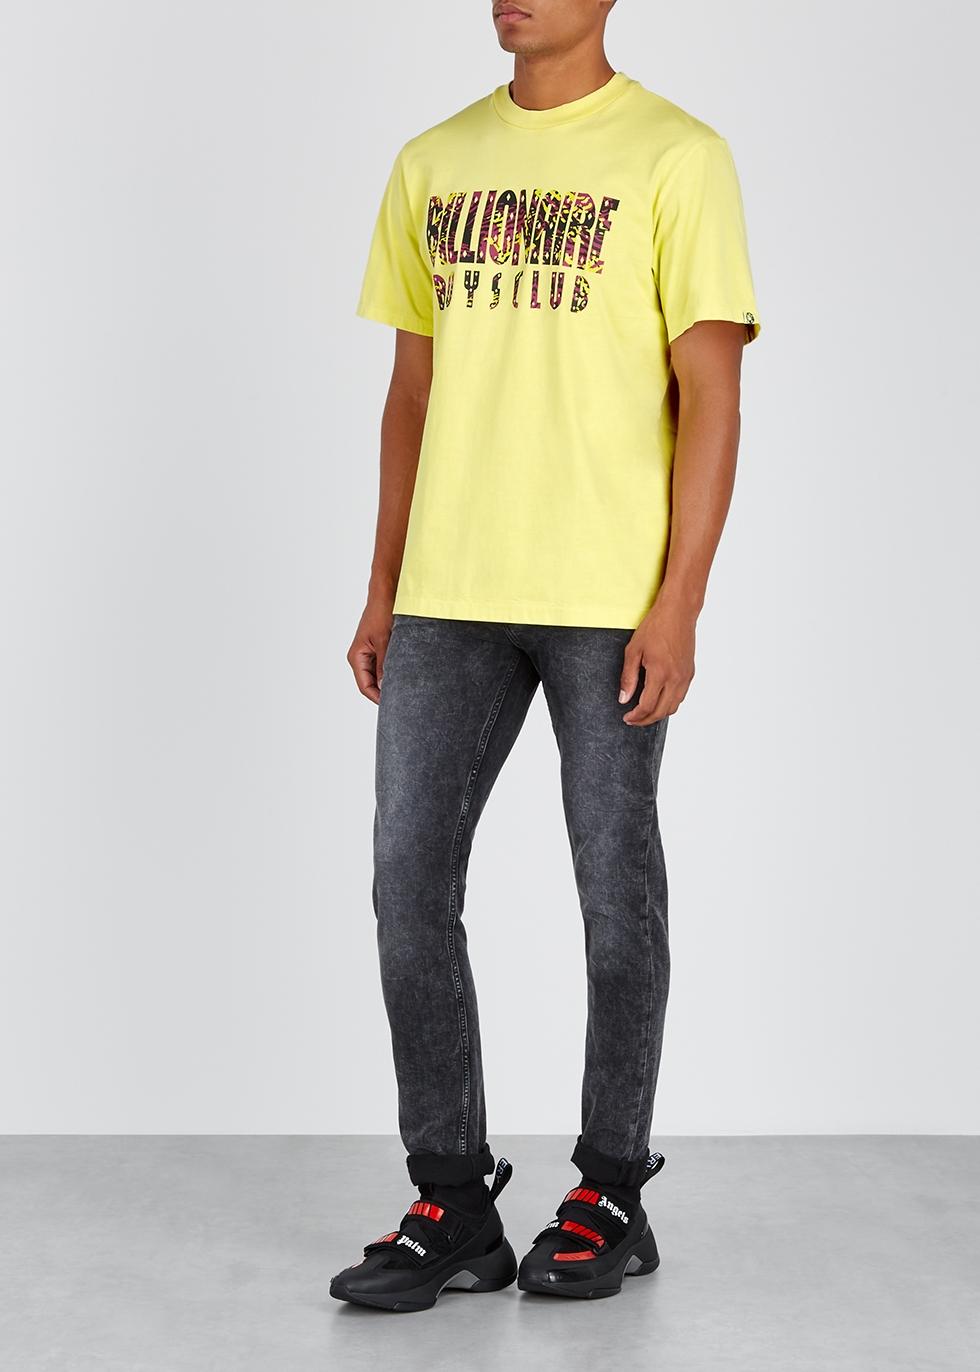 Fish yellow cotton T-shirt - Billionaire Boys Club